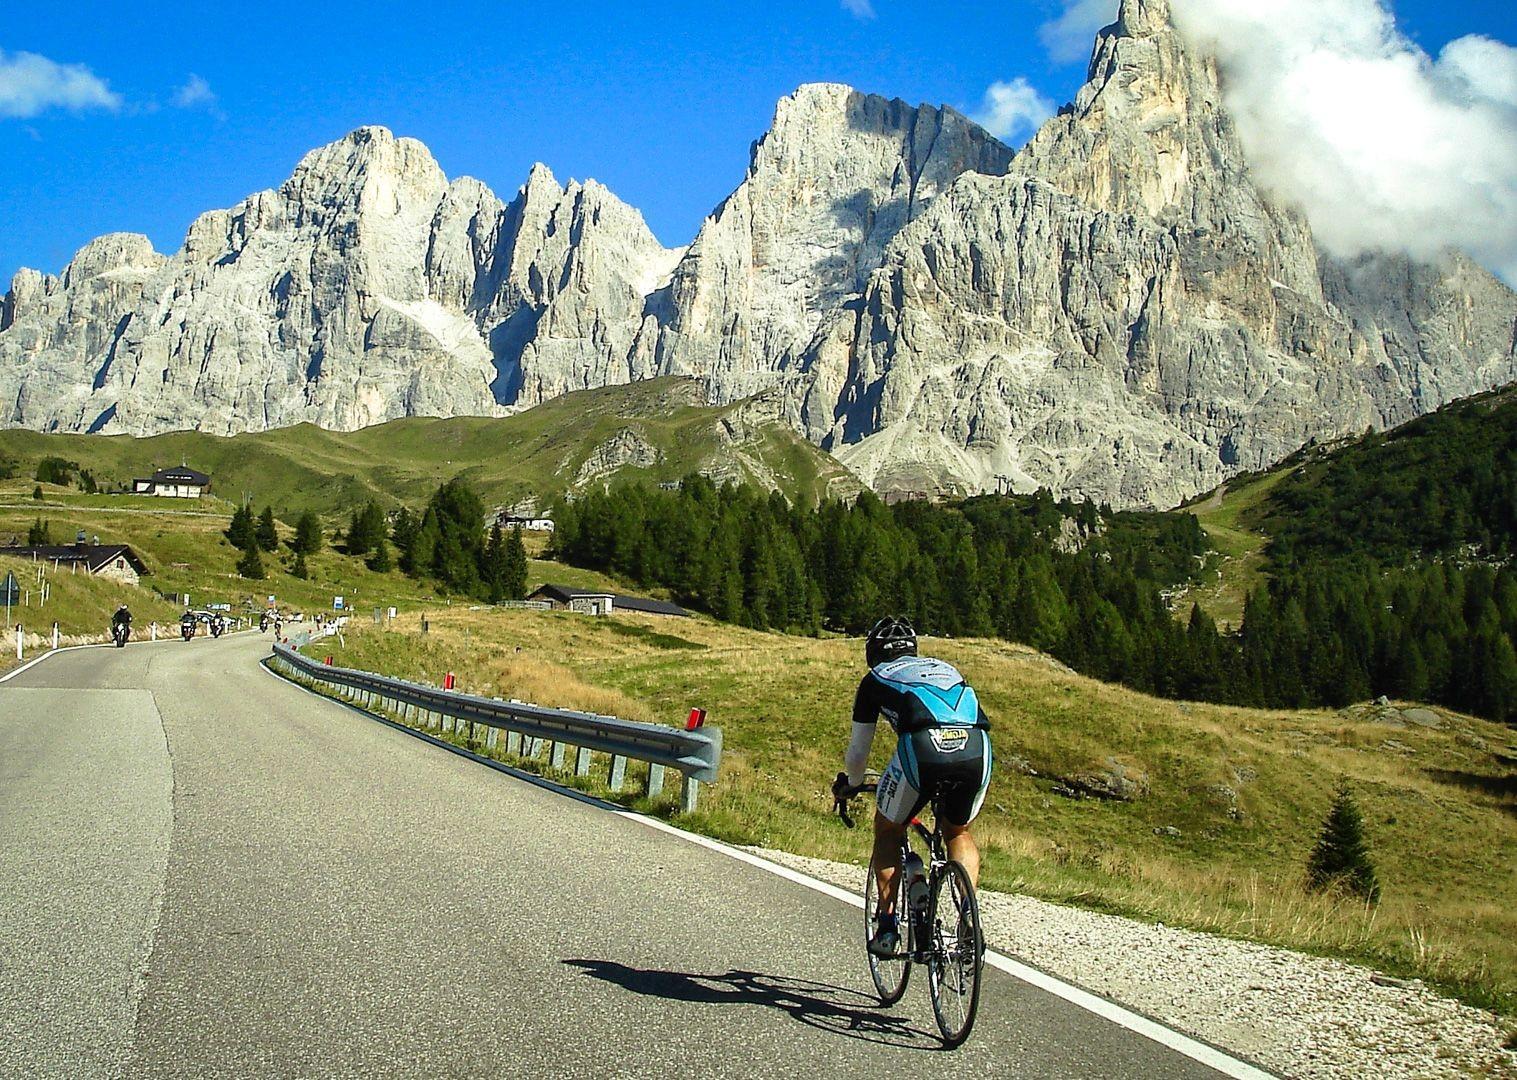 raid-dolomiti-saddle-skedaddle-mountain-passes.jpg - Italy - Raid Dolomiti - Guided Road Cycling Holiday - Italia Road Cycling